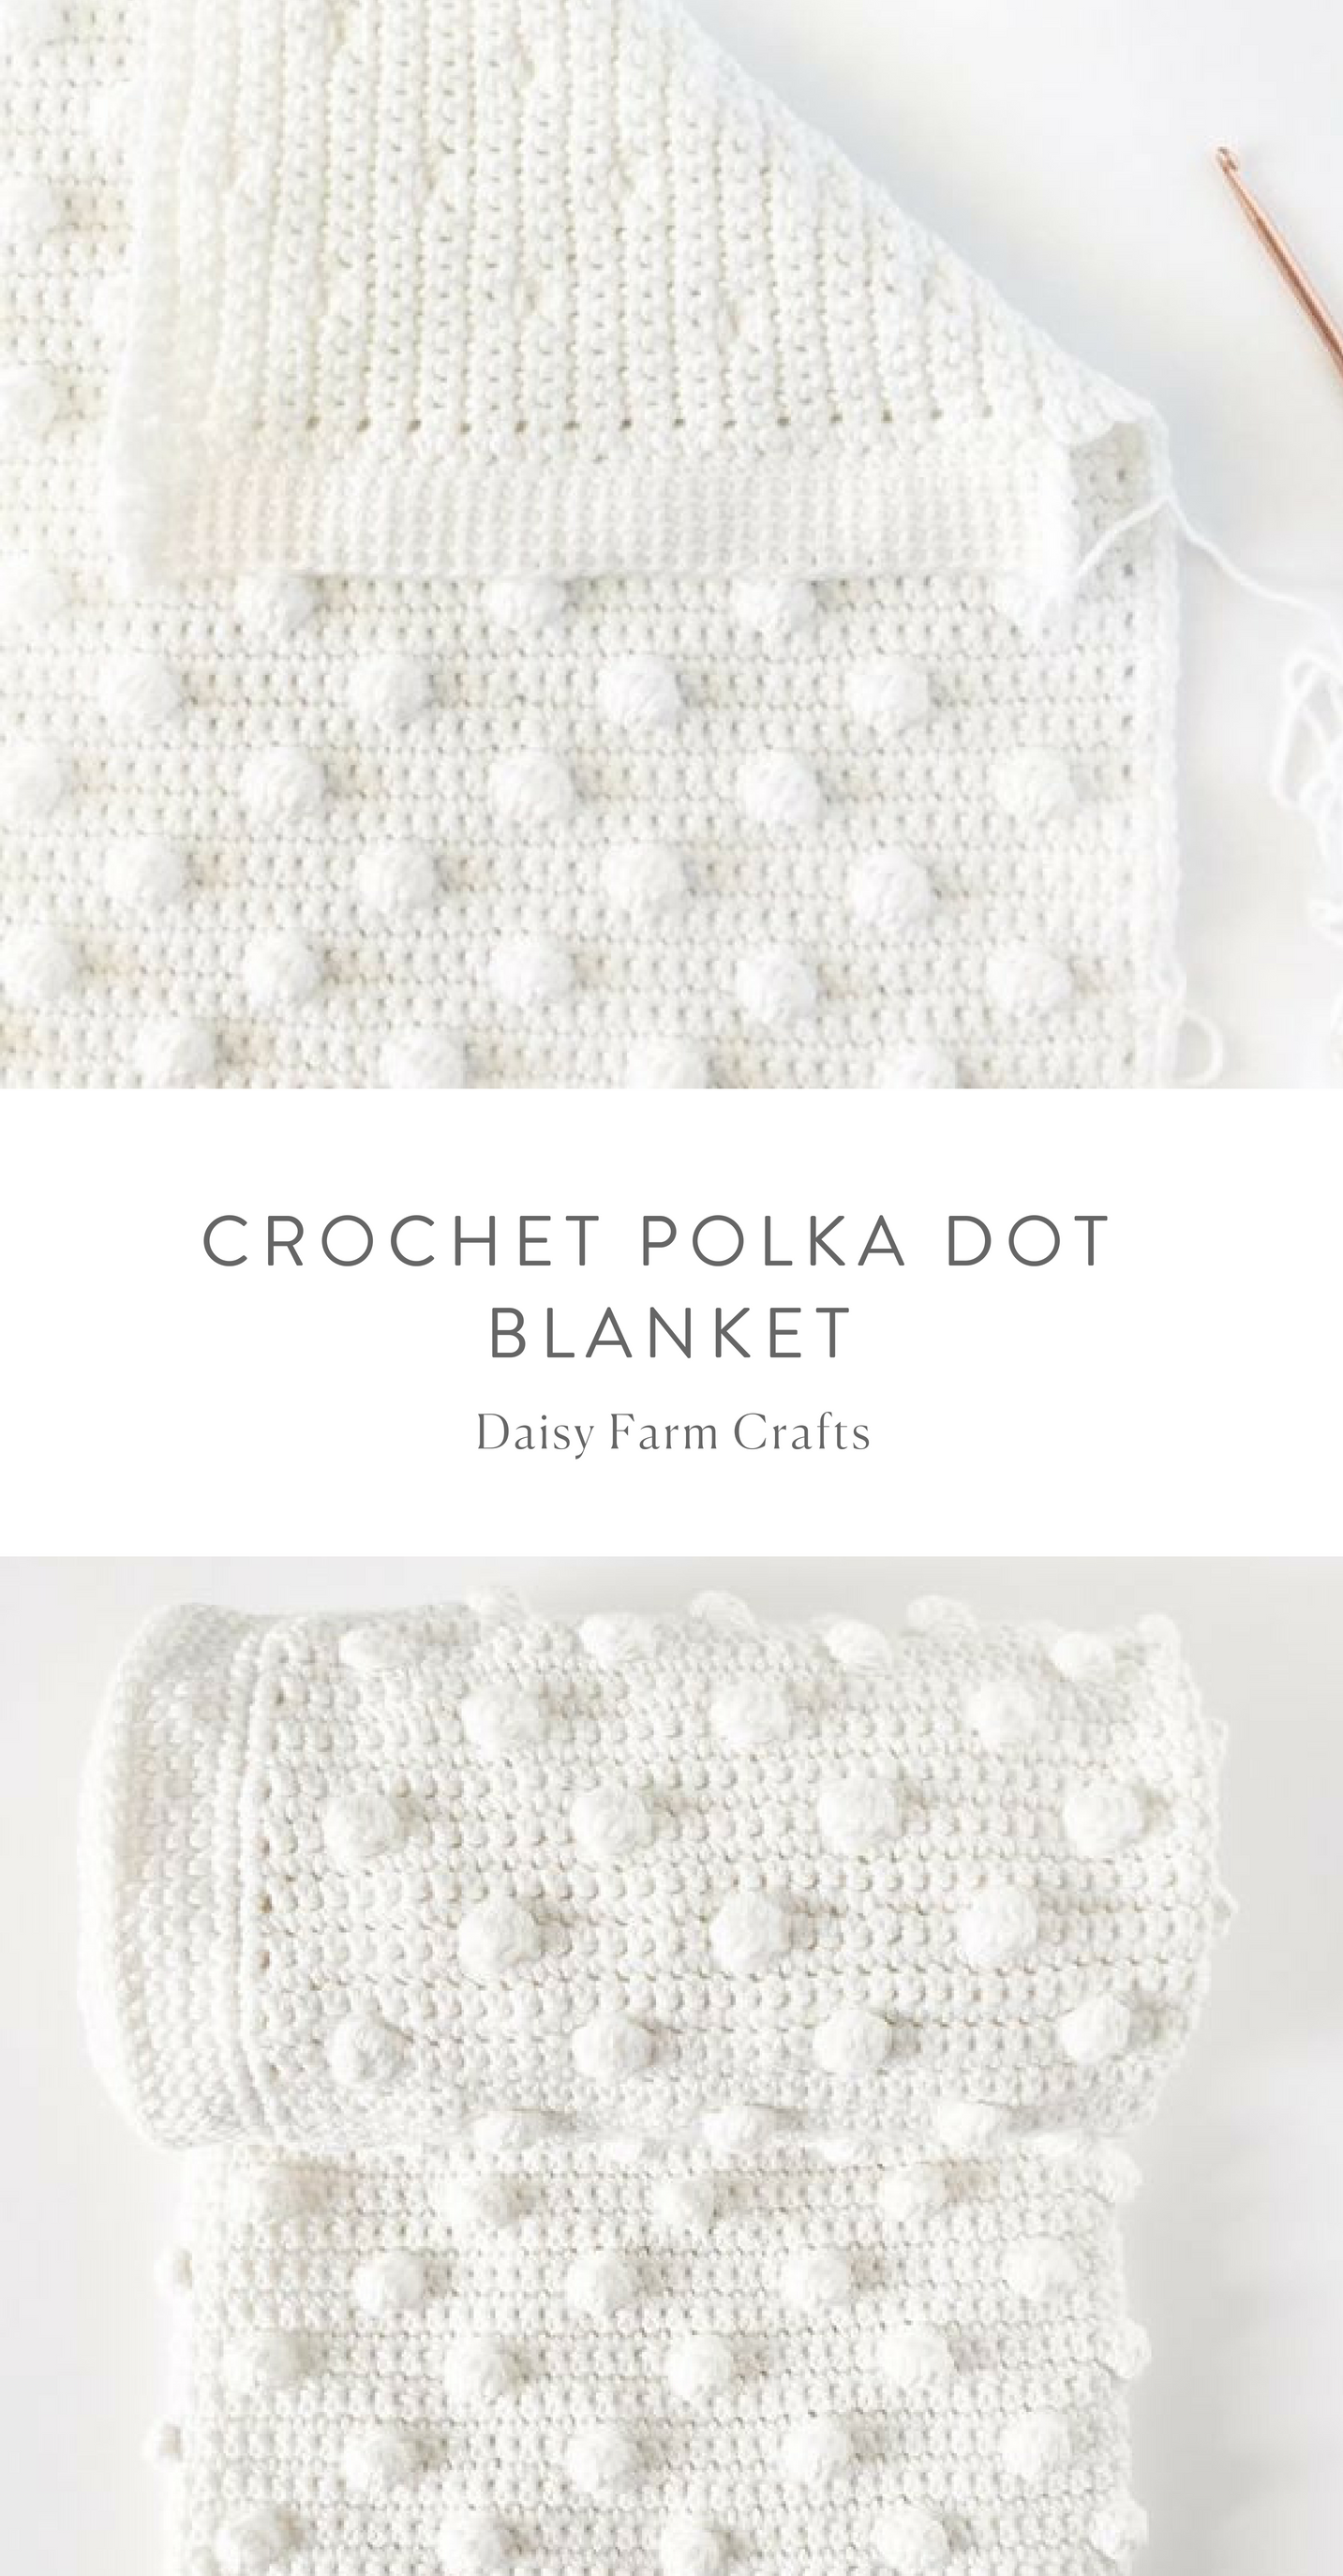 Free Pattern - Crochet Polka Dot Blanket #crochet | Crochet ...